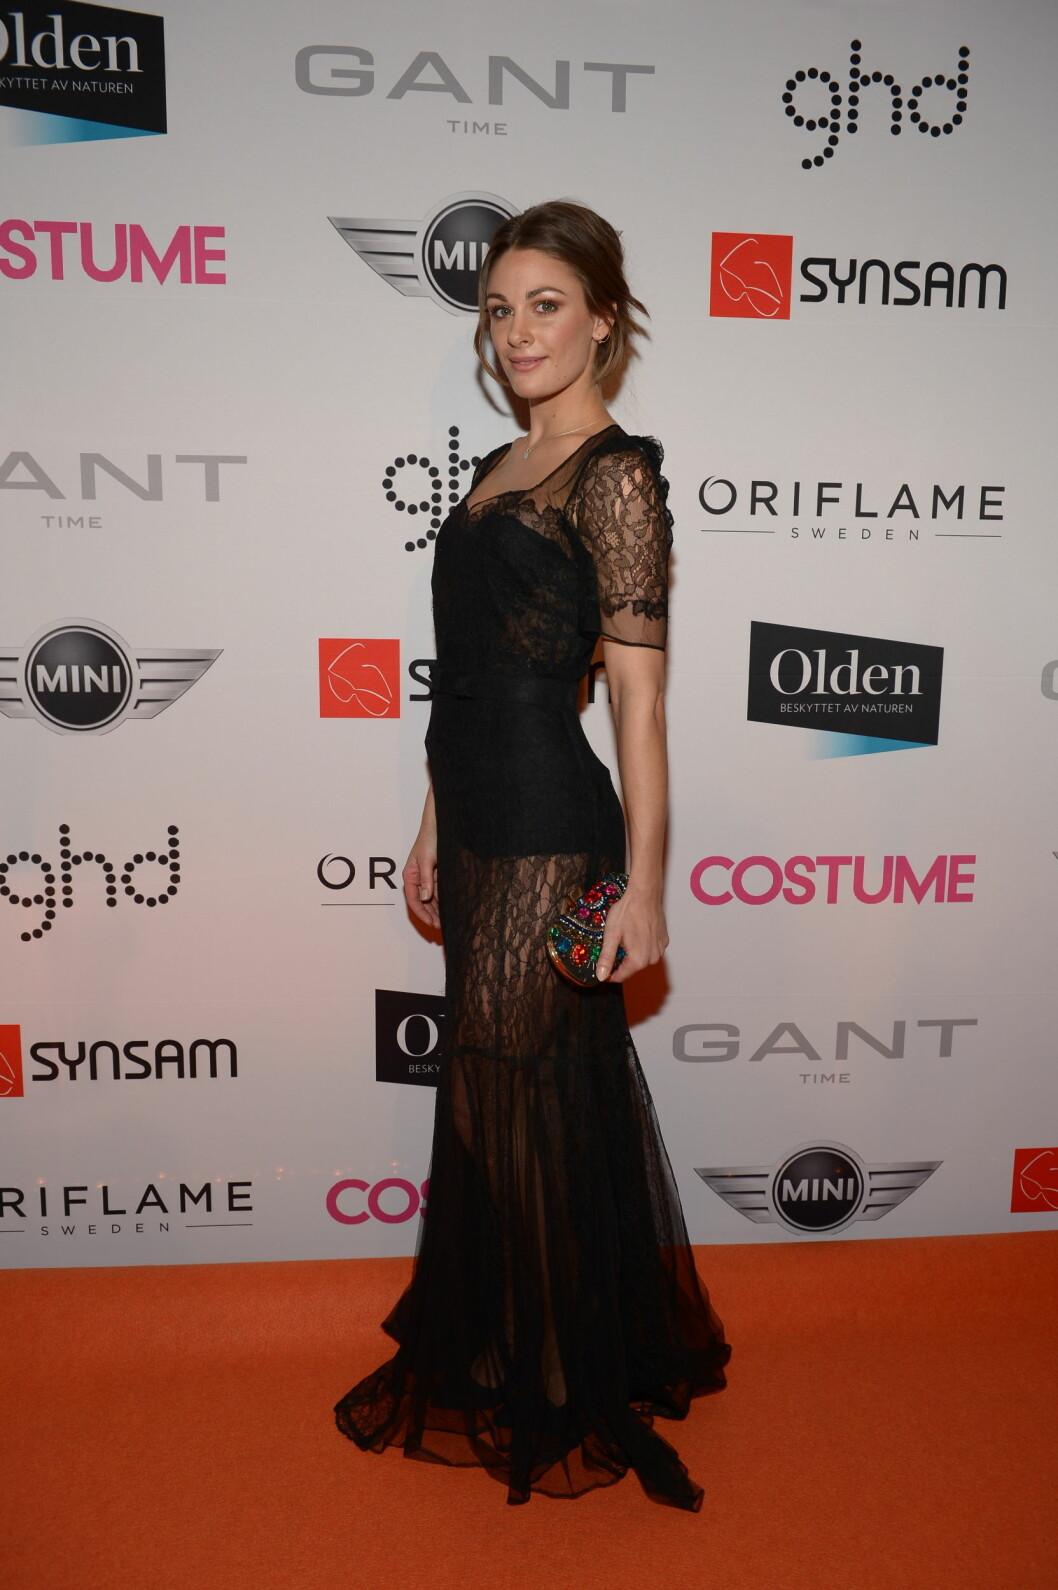 SYDDE OM: Jenny Skavlan hadde arvet en gammel Hollywood-kjole som hun hadde gjort dristigere for anledningen.  Foto: FameFlynet Norway